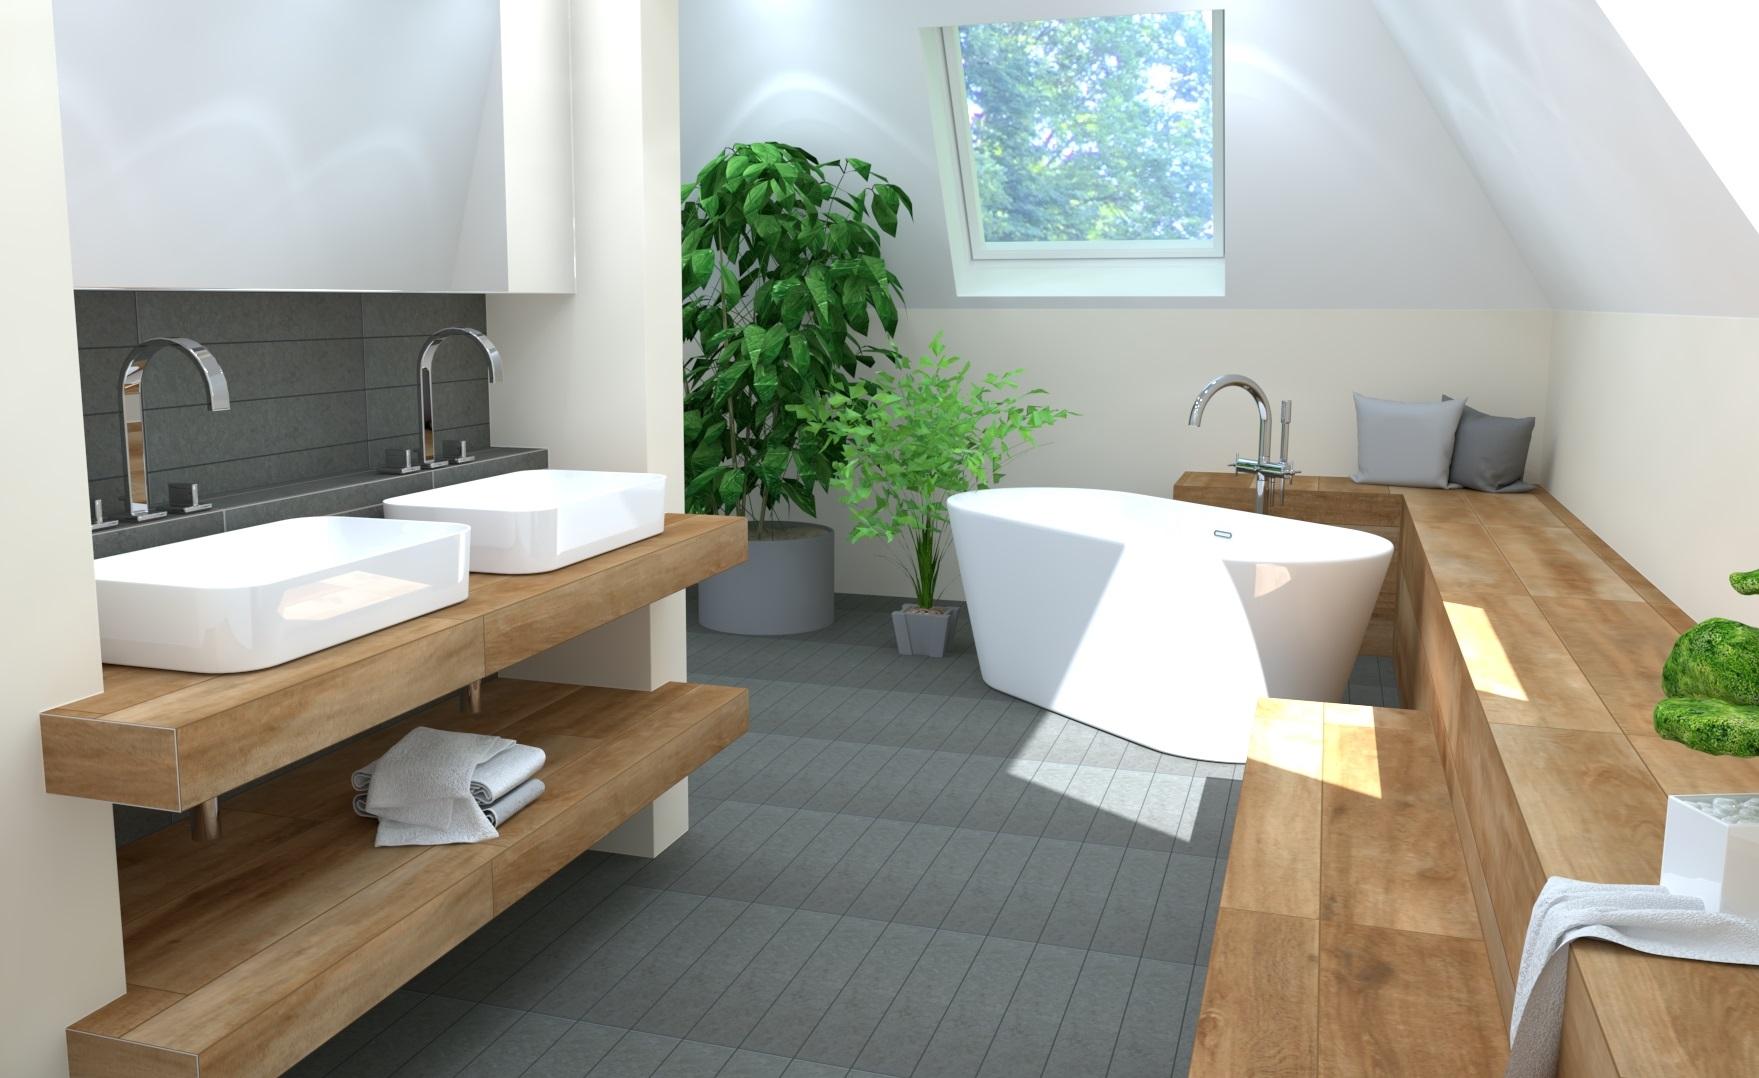 Badezimmer mit Holz Hannover